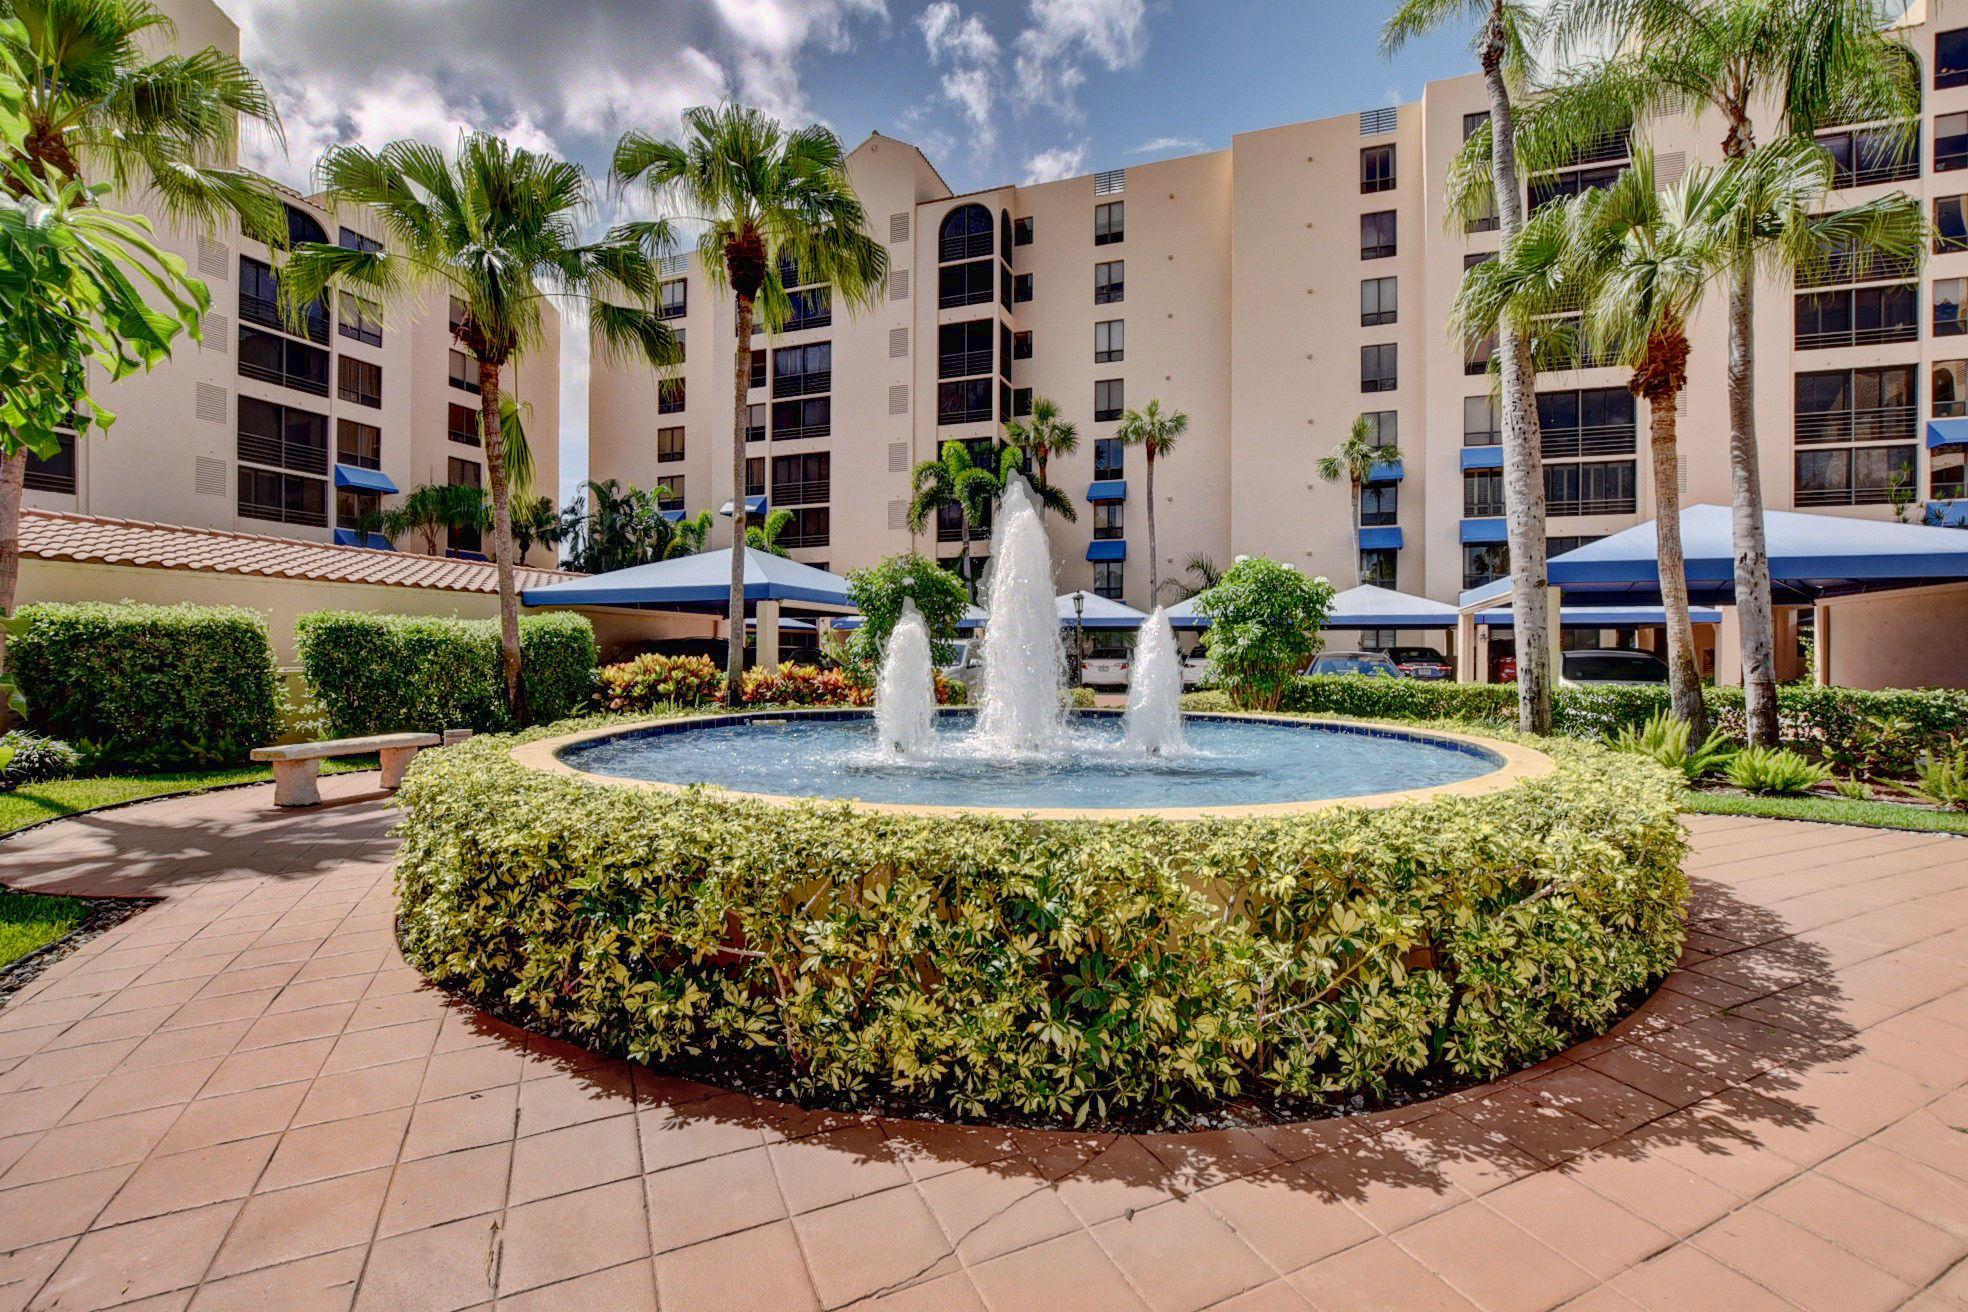 7194 Promenade Drive 802 D Boca Raton, FL 33433